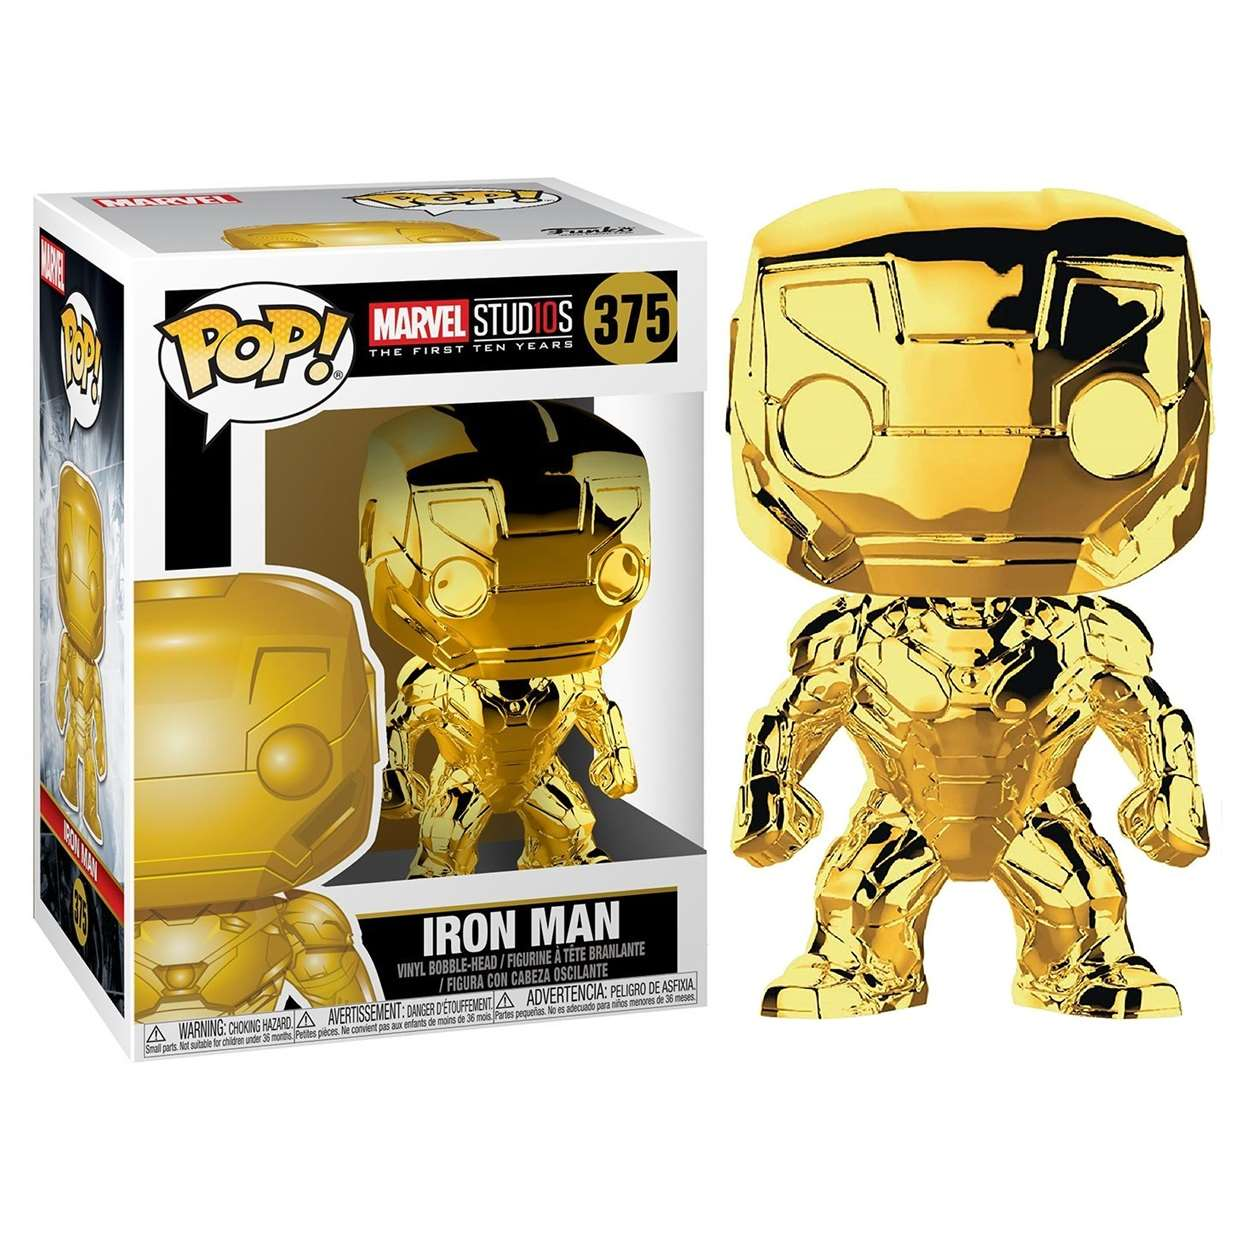 Iron Man #375 Figura Marvel Studios 10th Anniversary